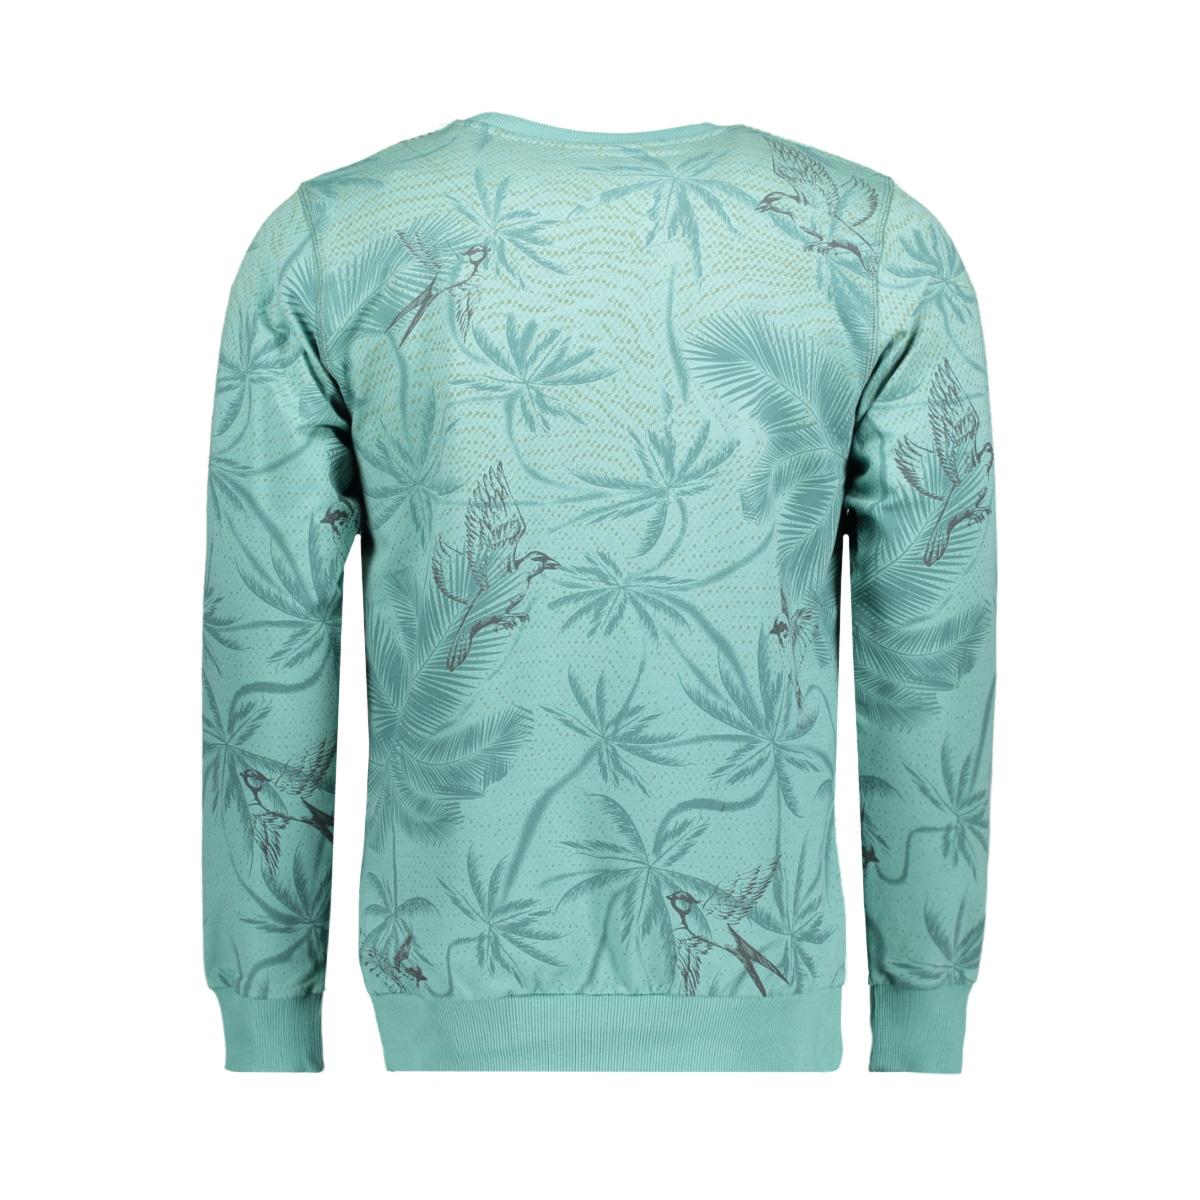 76117 gabbiano sweater mint